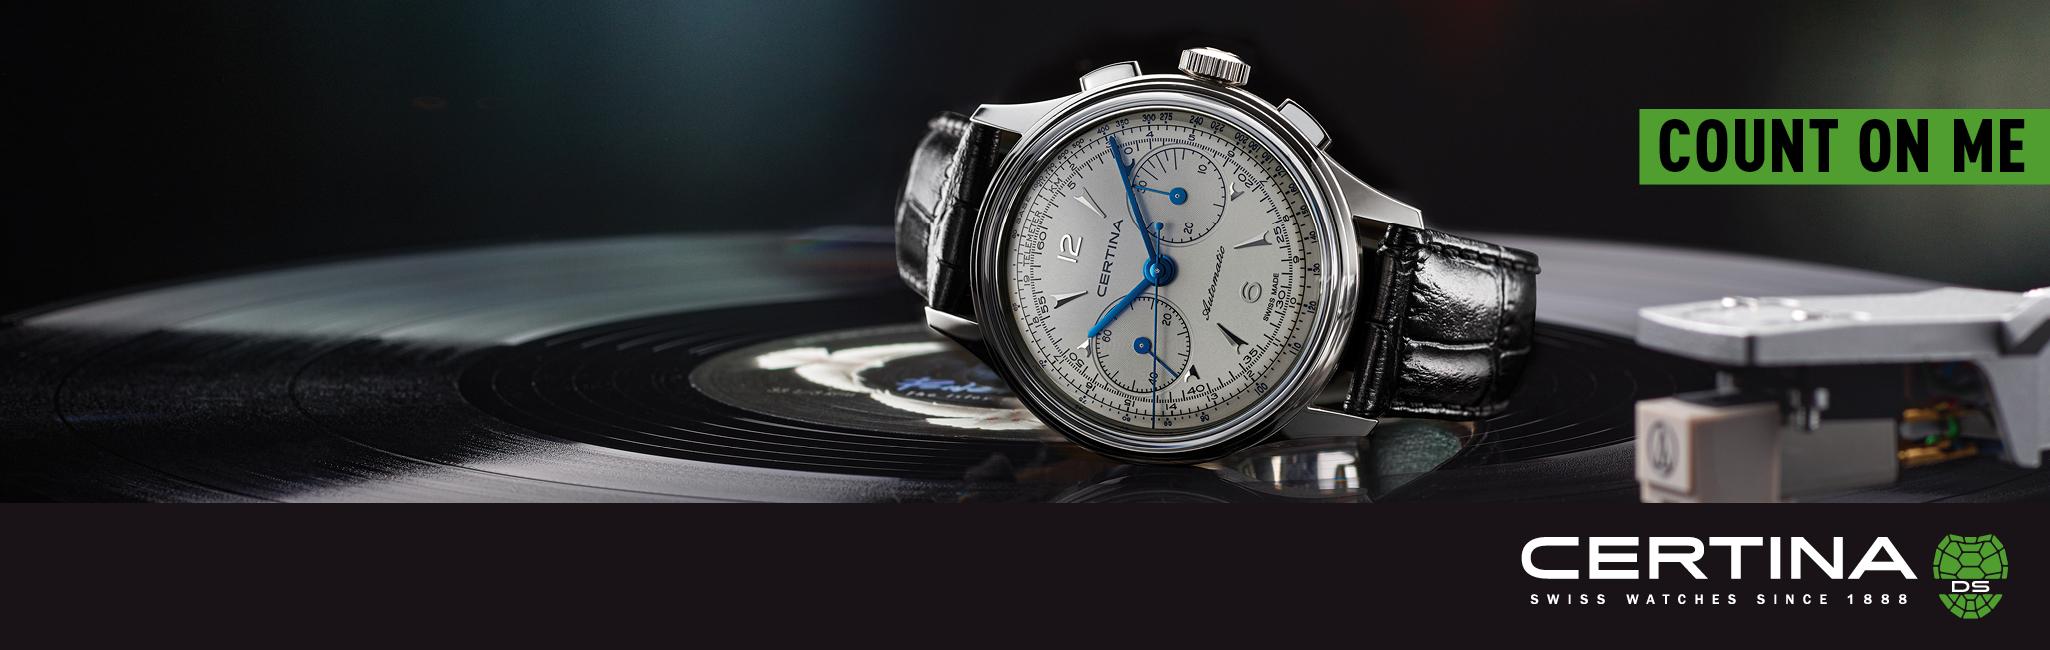 Certina Uhren Online Shop